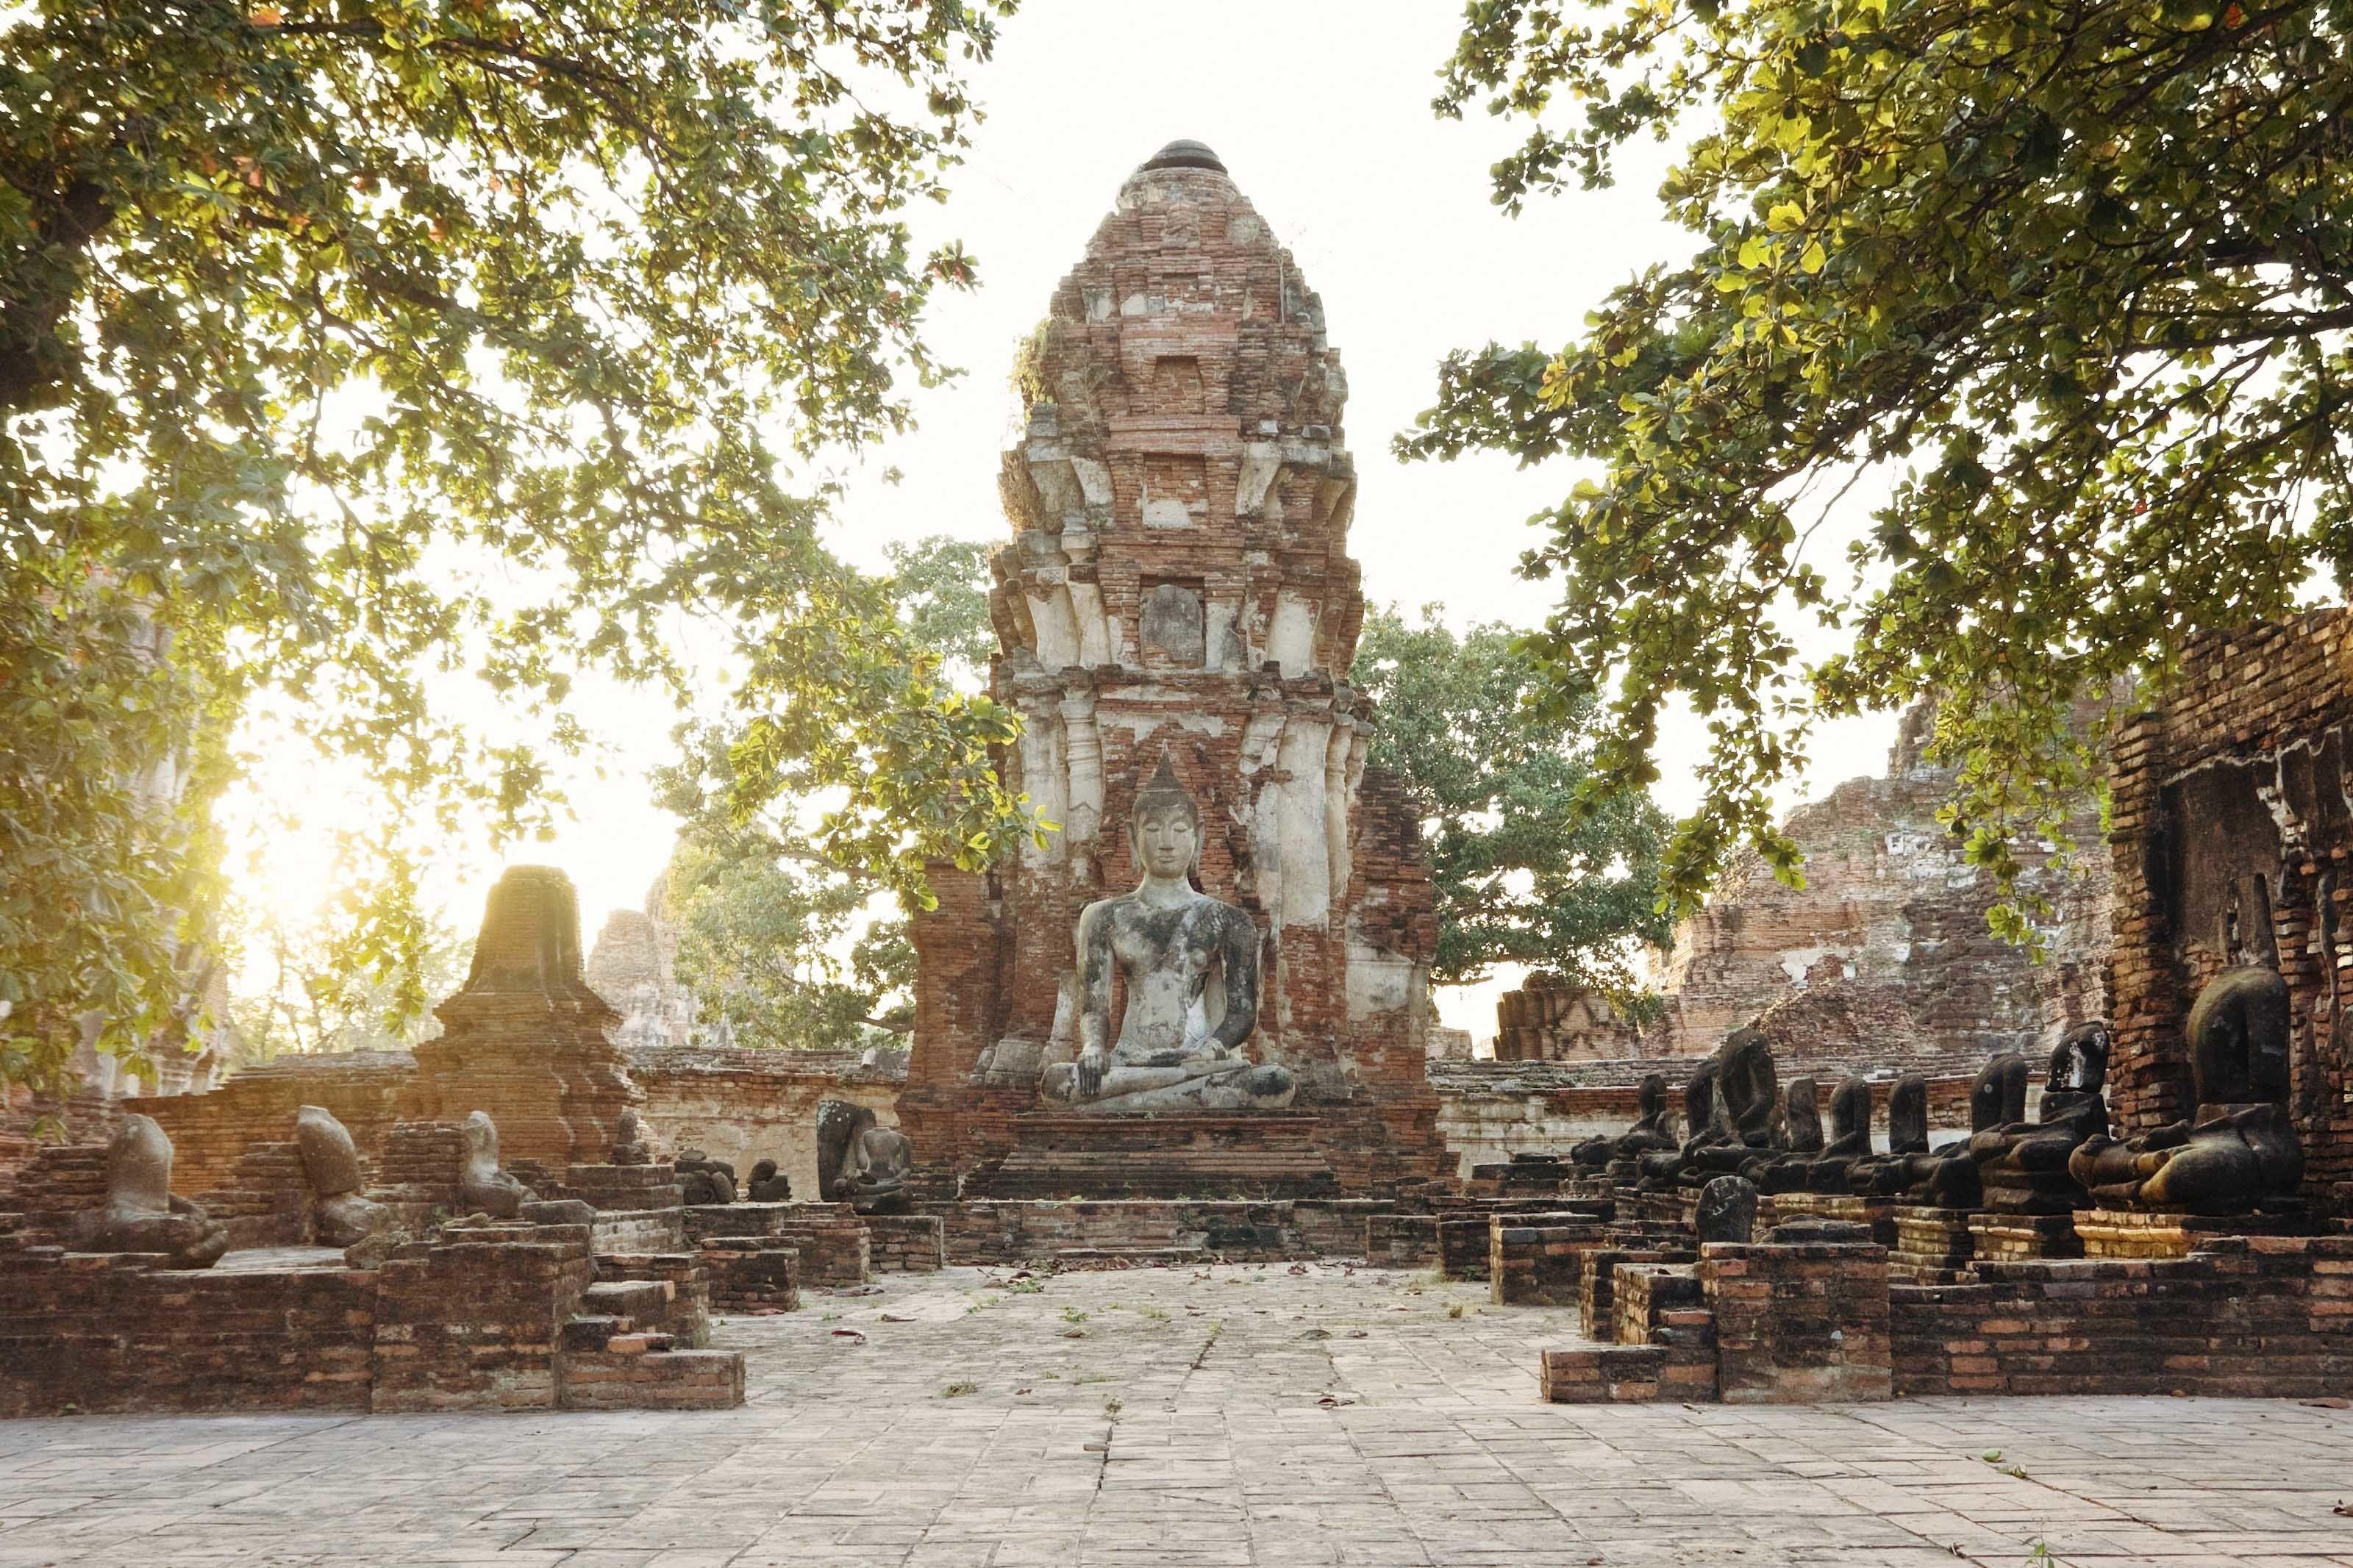 Explore Ayutthaya & Bangkok by Bicycle